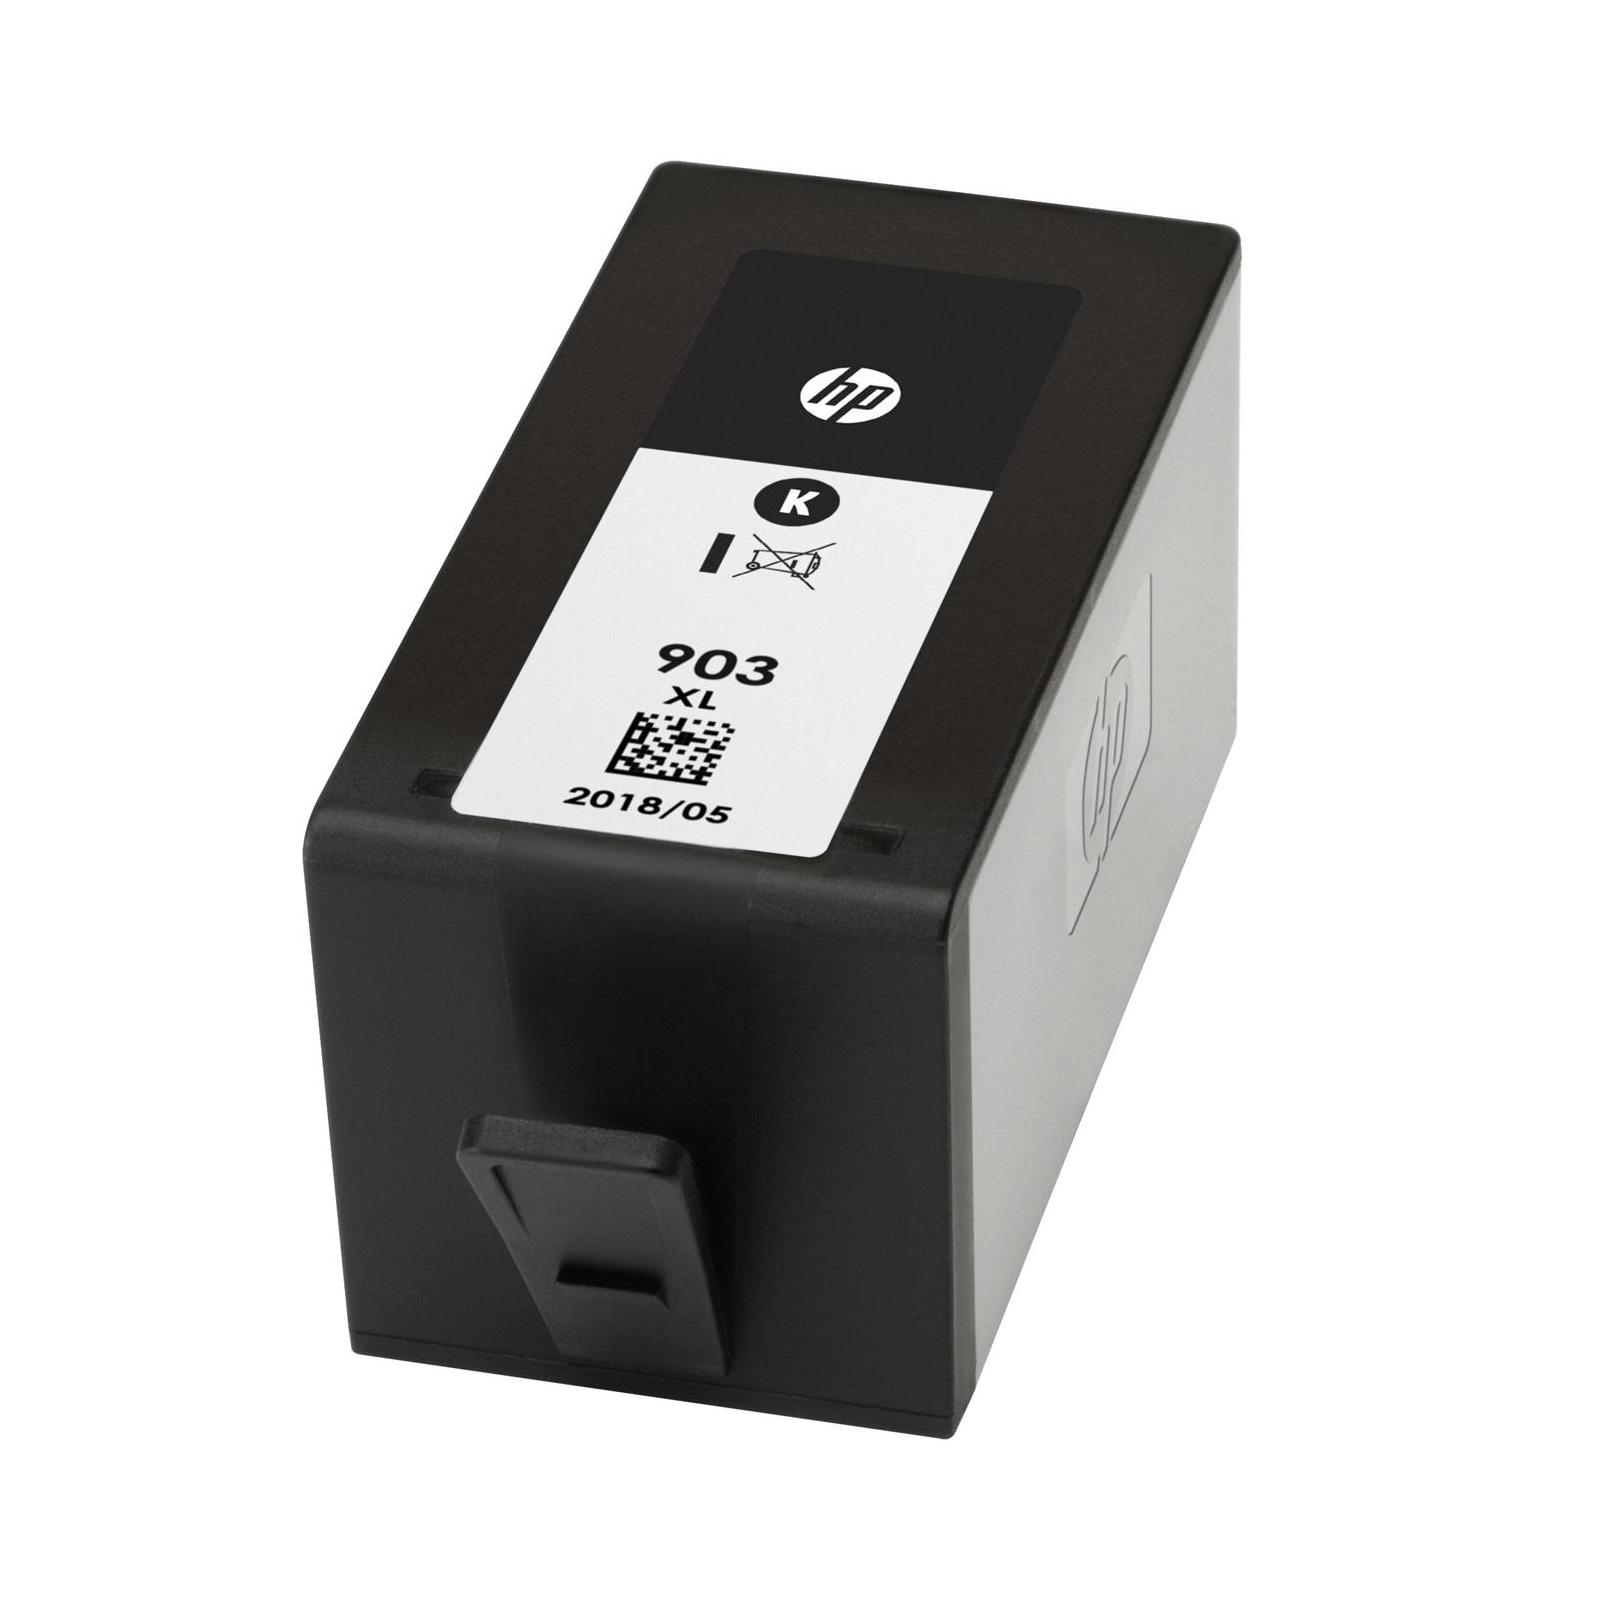 Картридж HP DJ No.903XL Black, OfficeJet 6950/6960/6970 (T6M15AE) изображение 2